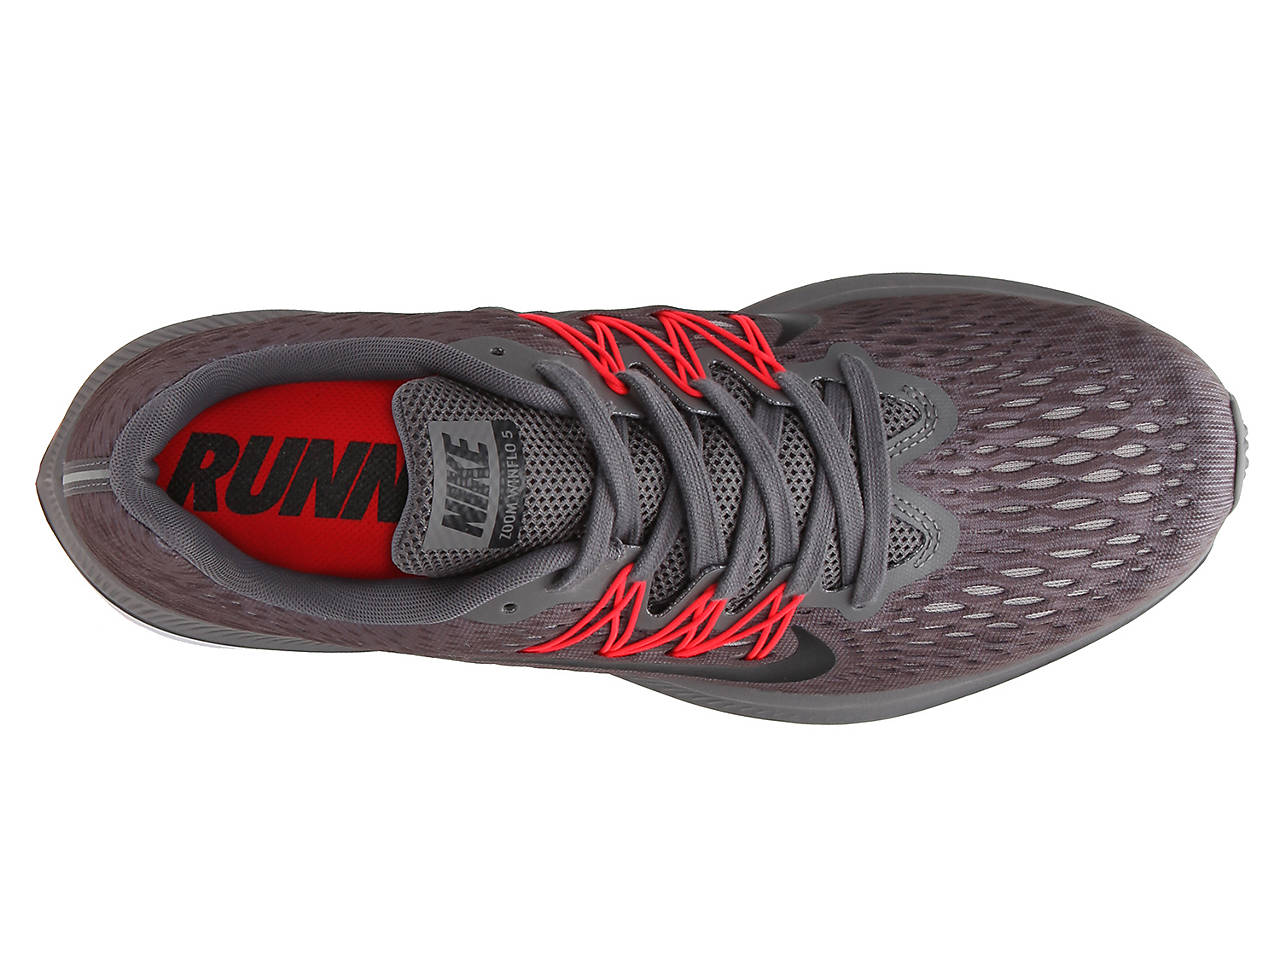 81630ec3d1a0 Nike Zoom Winflo 5 Lightweight Running Shoe - Men s Men s Shoes